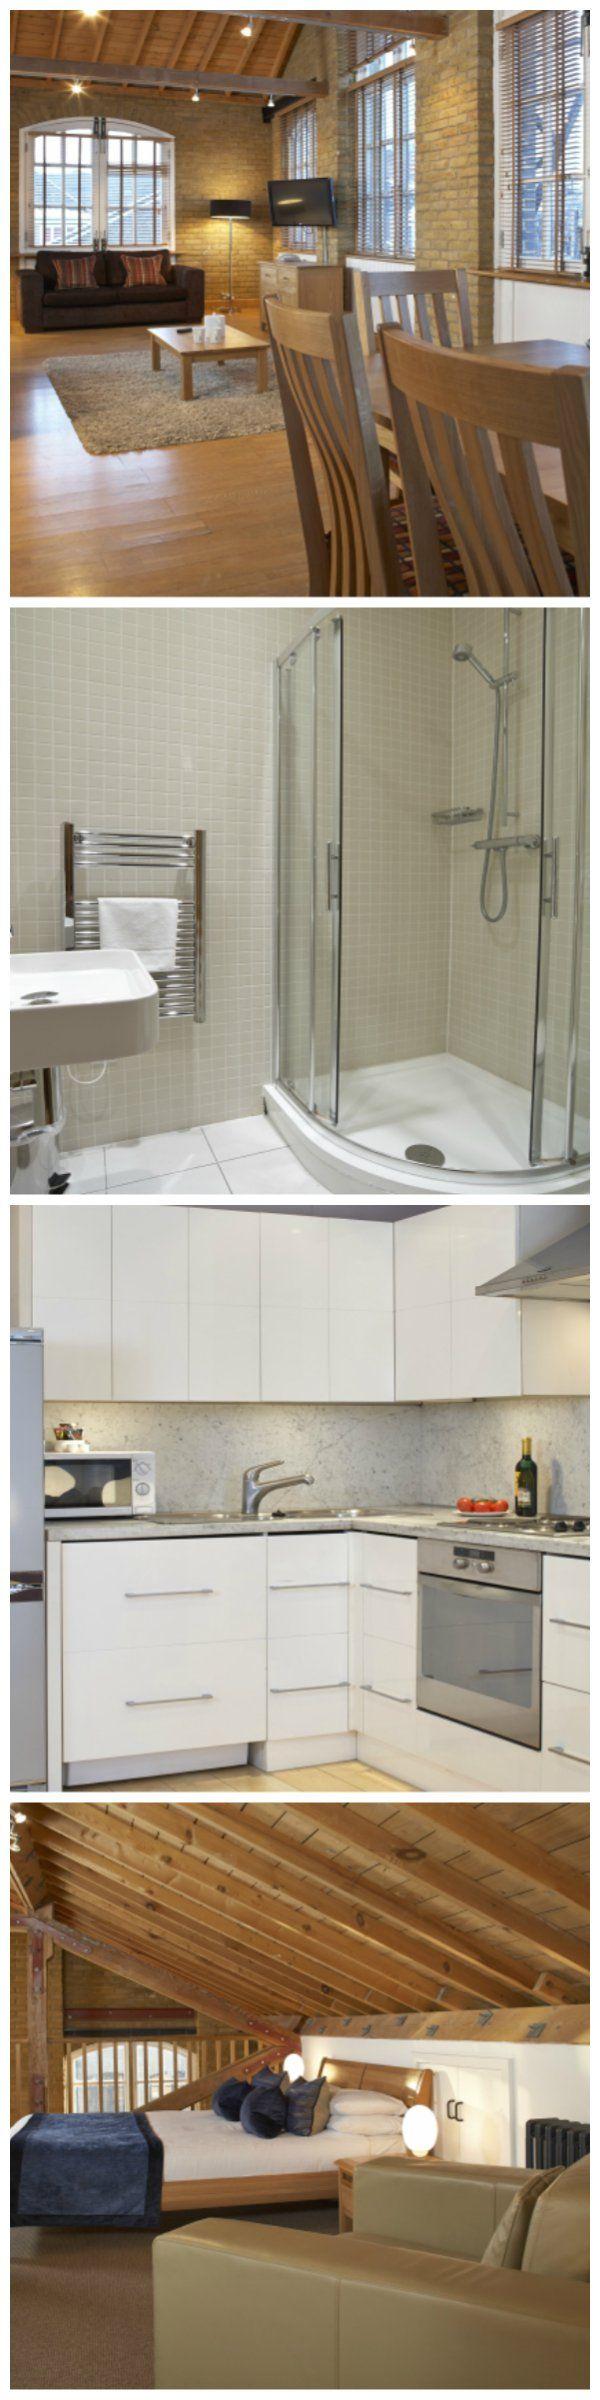 the 25+ best serviced apartments london ideas on pinterest | city